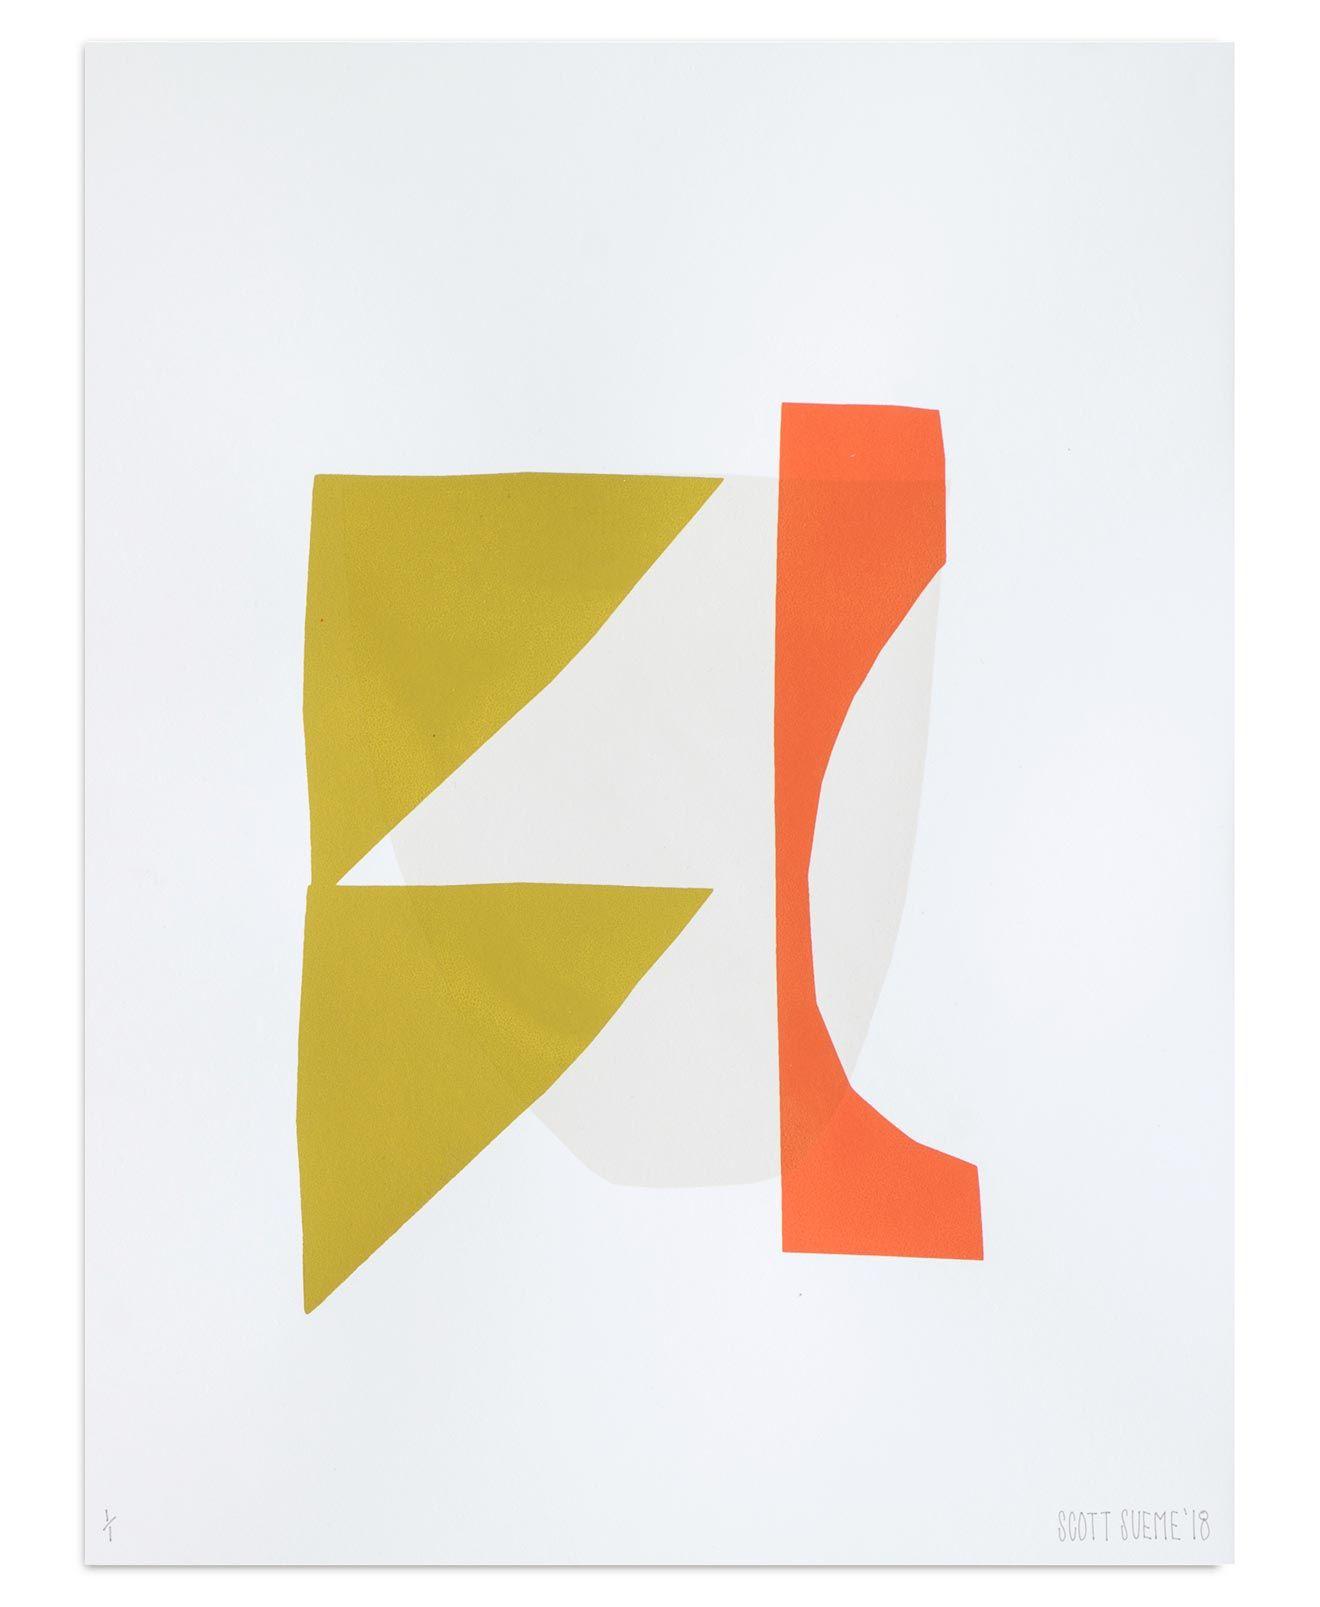 Worksheet 20 By Scott Sueme Acrylic On Screenprint And